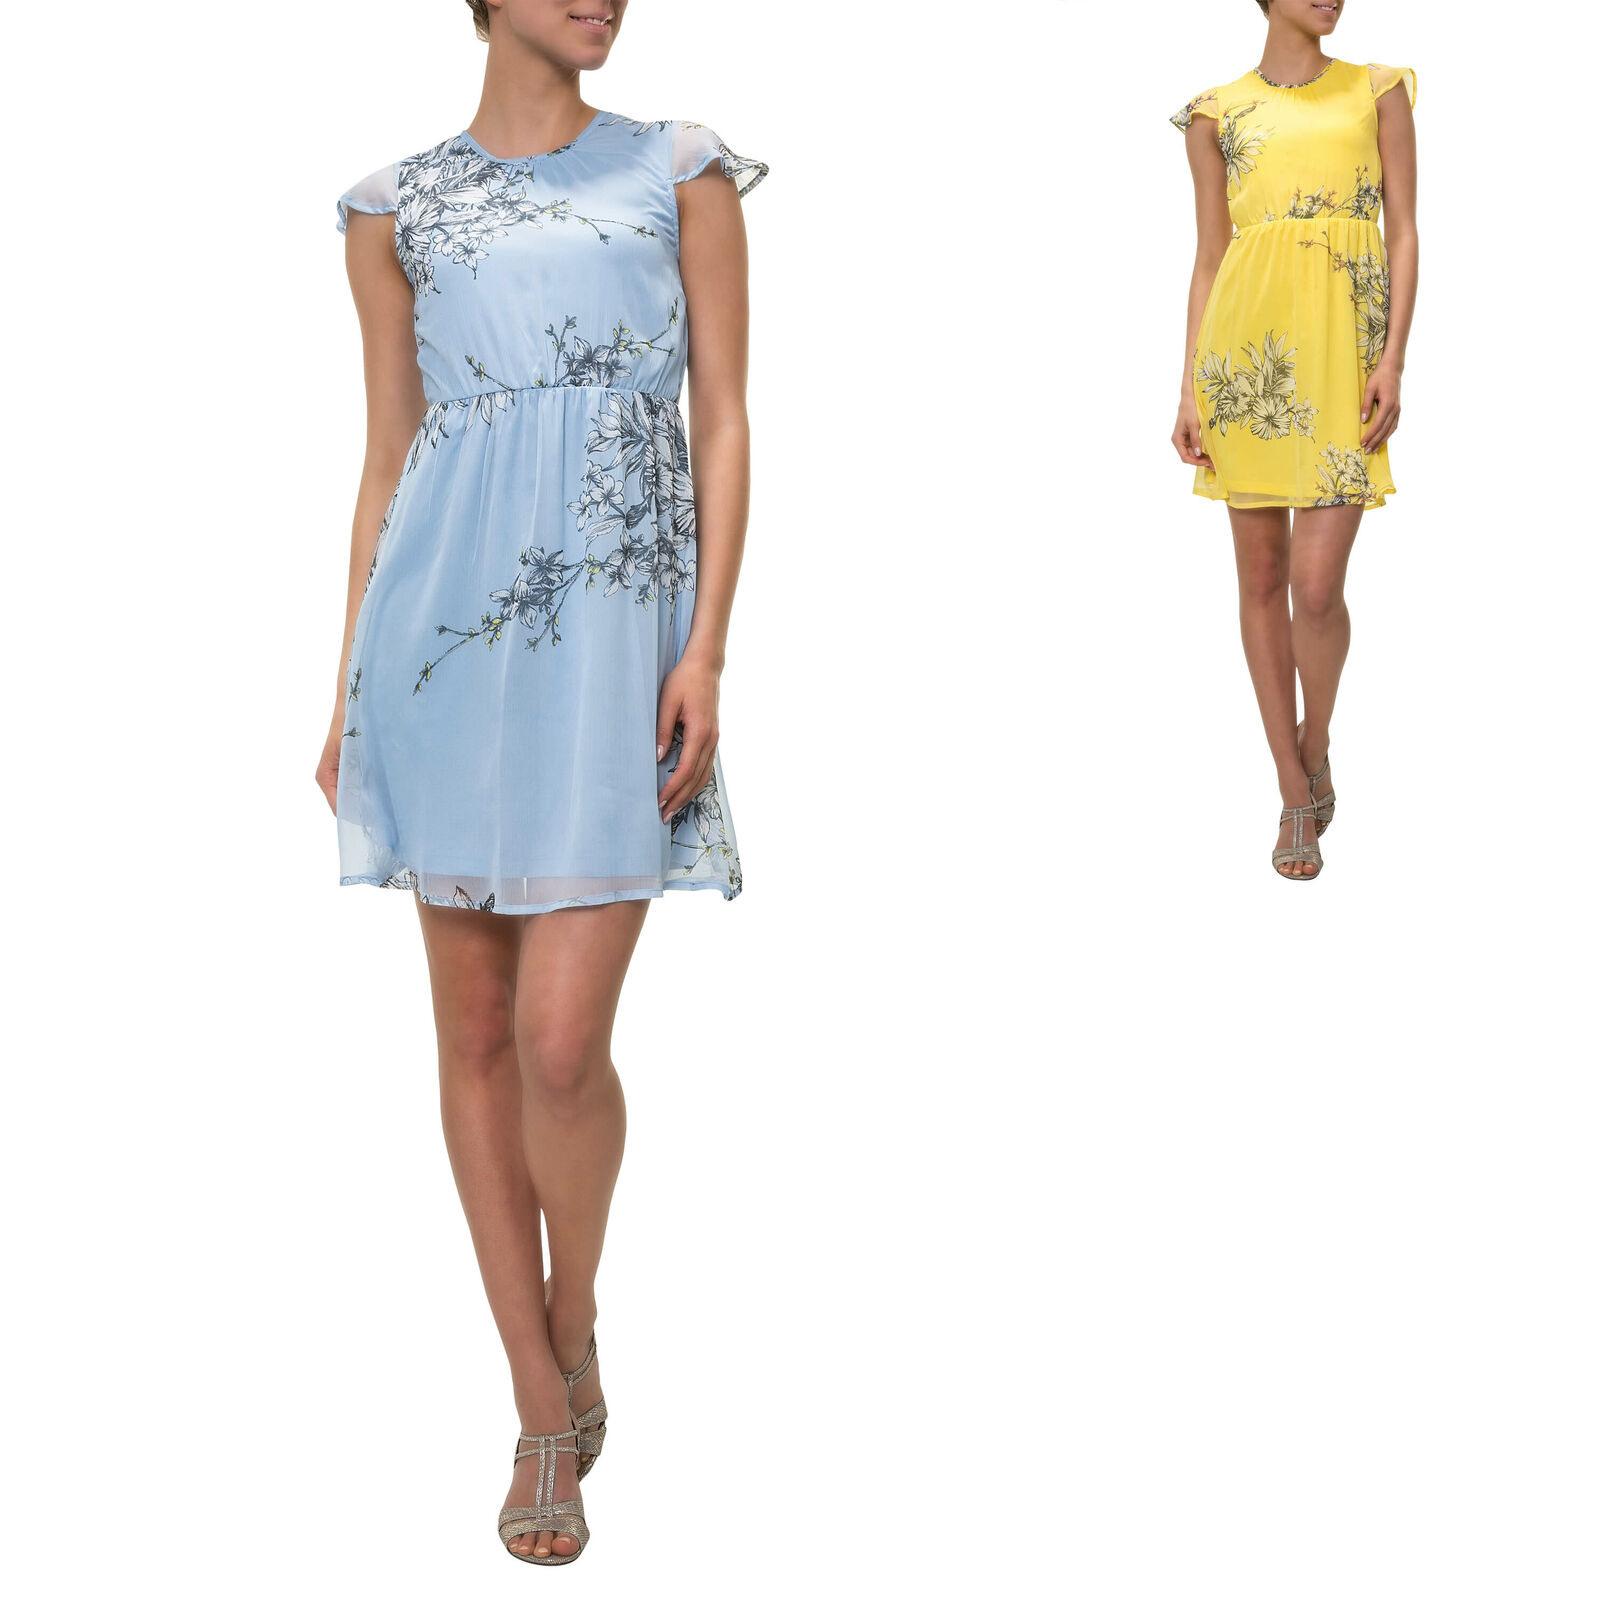 Only Damen Kleid Sommerkleid Trägerkleid Alinien Kleid